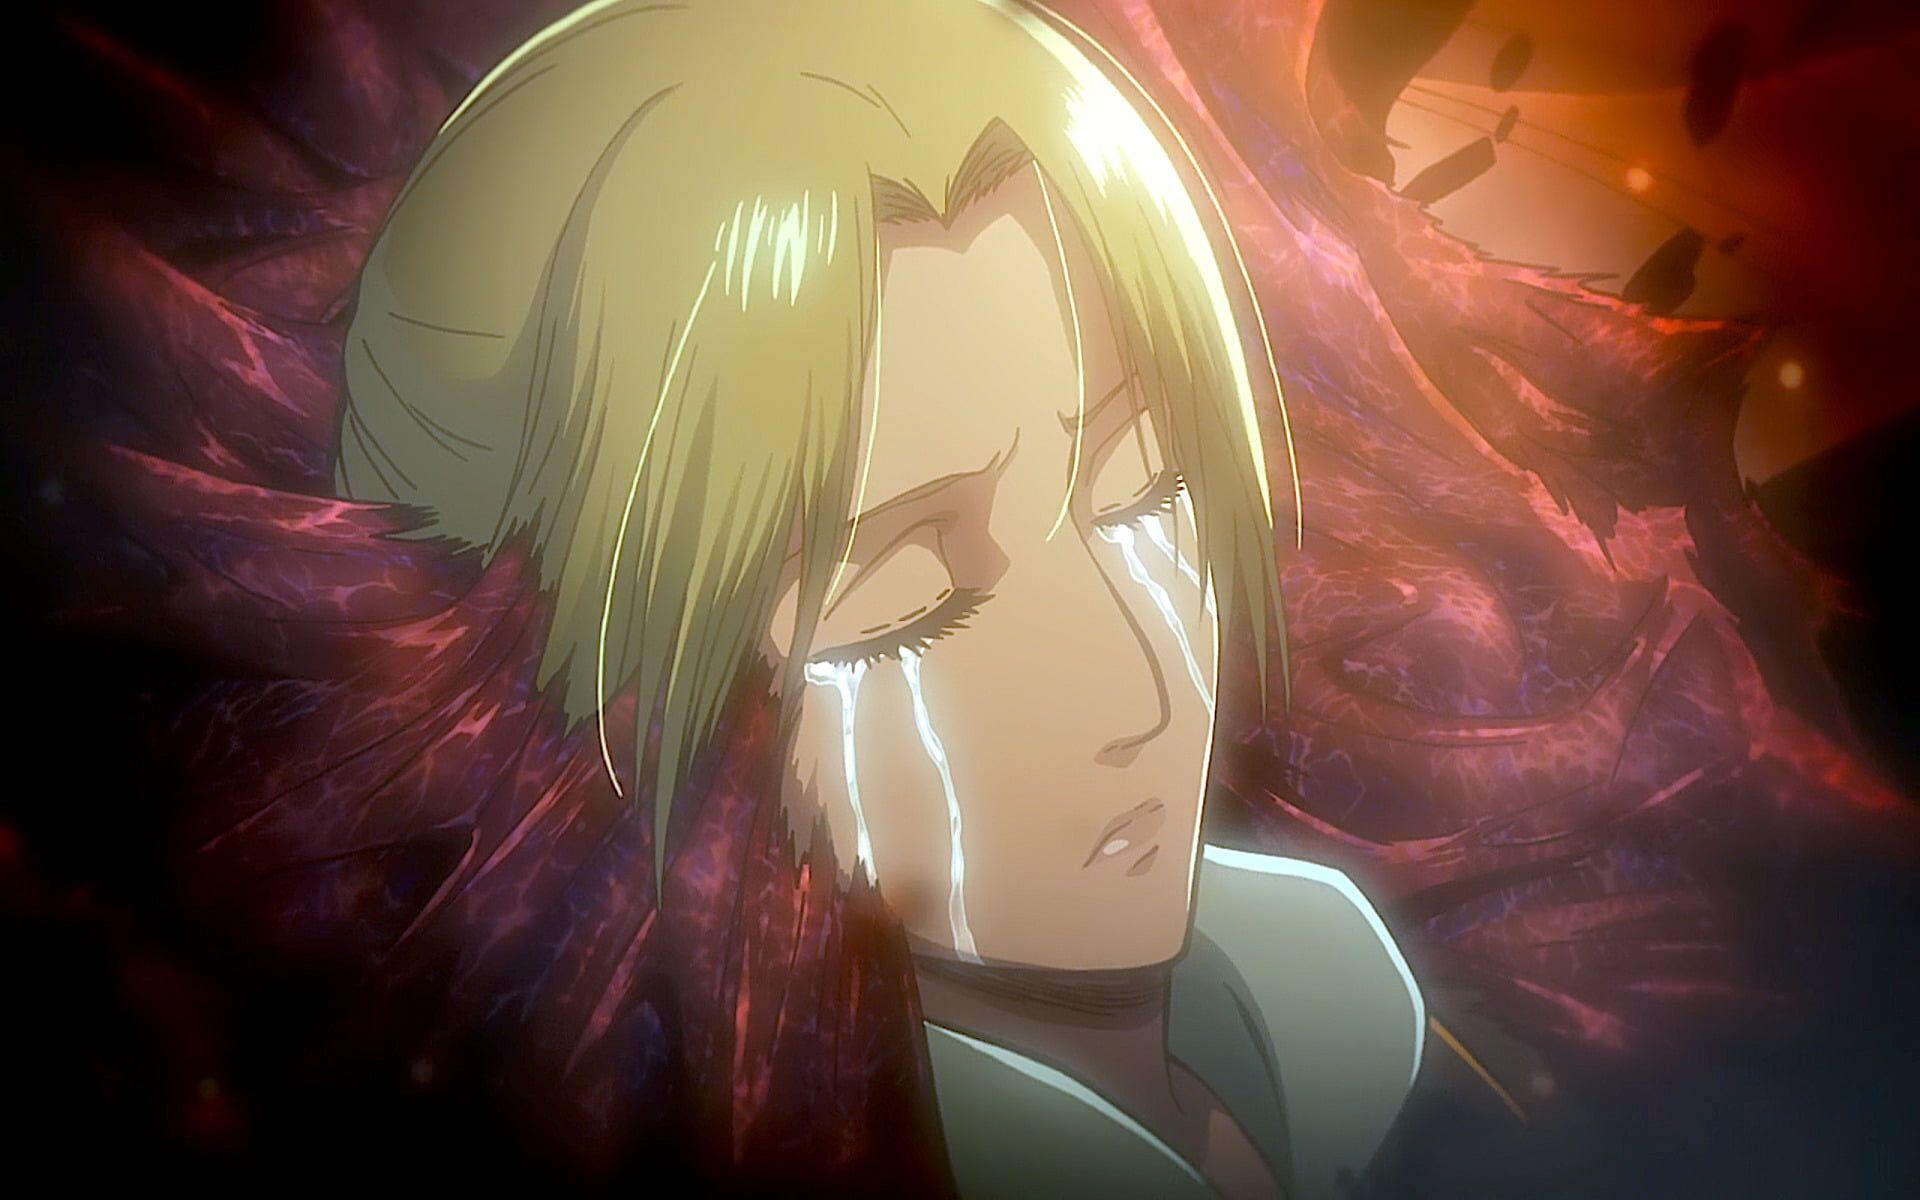 Anime Attack On Titan Annie Leonhart Attack On Titan Crying Shingeki No Kyojin 1080p Wallpaper Hdwall Annie Leonhart Attack On Titan Attack On Titan Anime